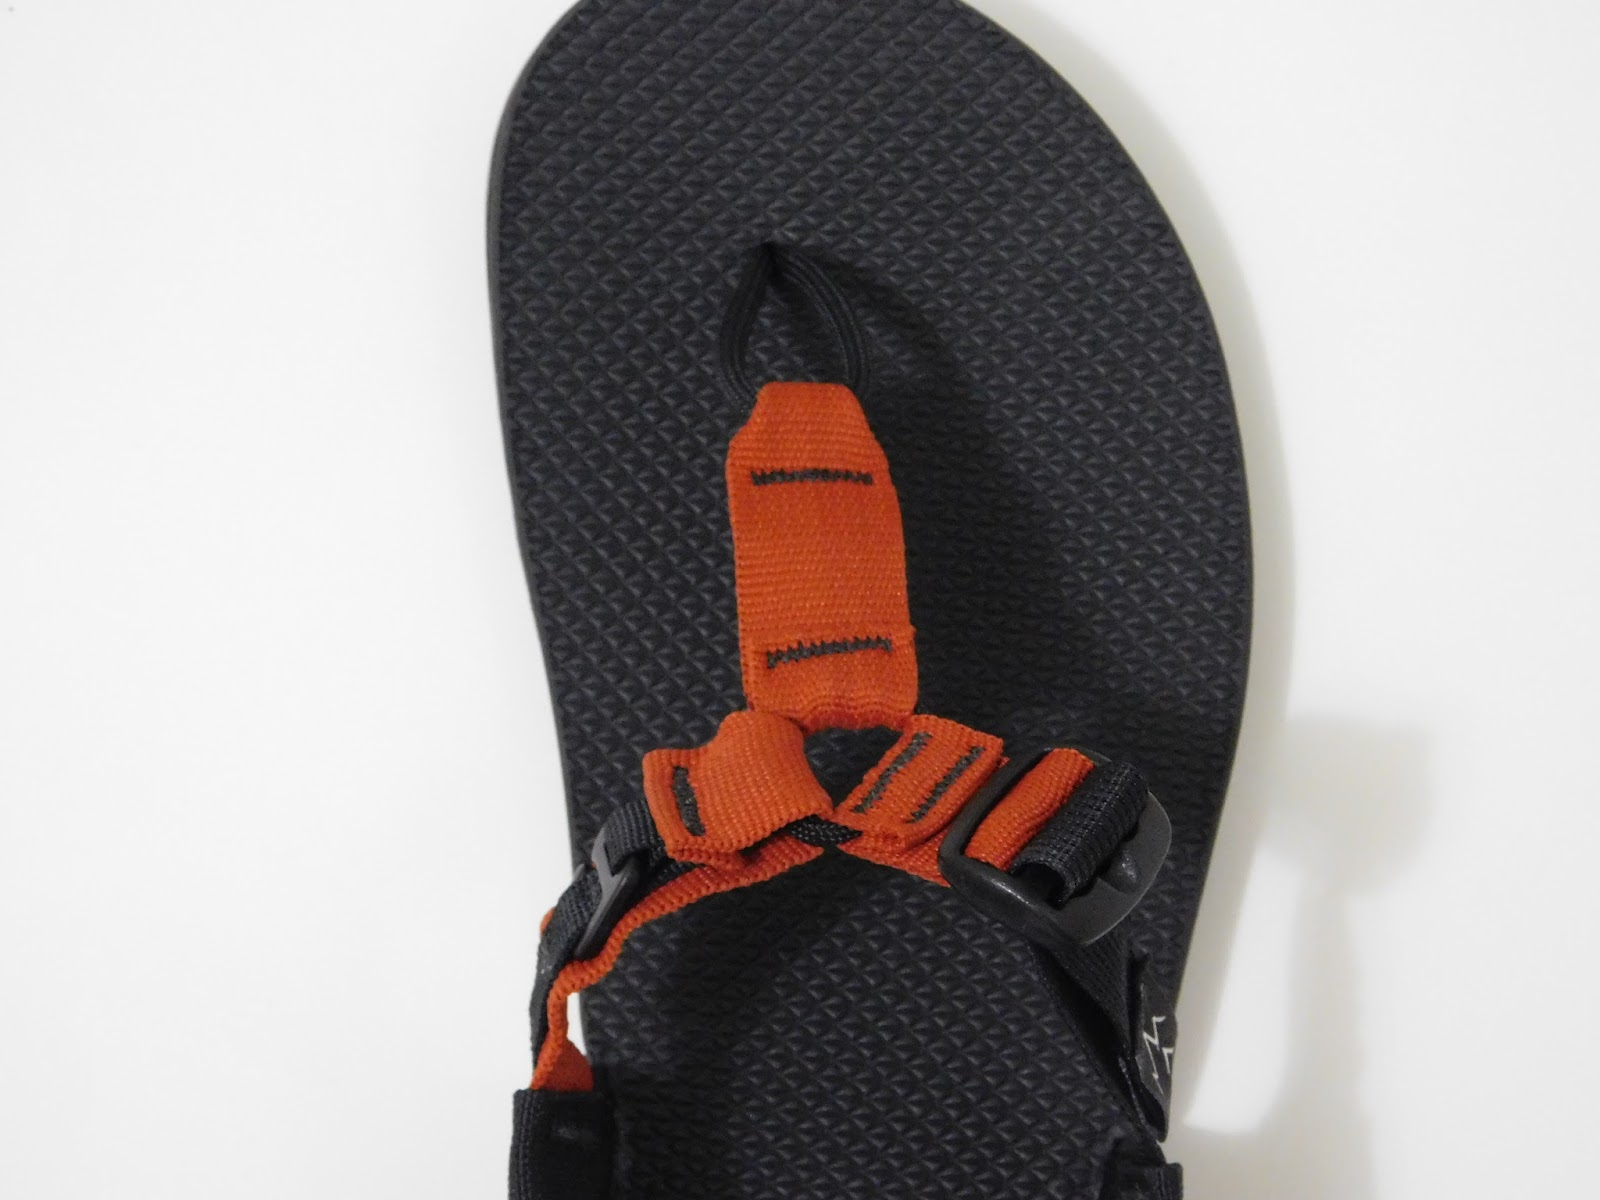 Sandals Sandals ProofBedrock Cairn ProofBedrock Bonk Review Cairn Bonk 7yg6fb